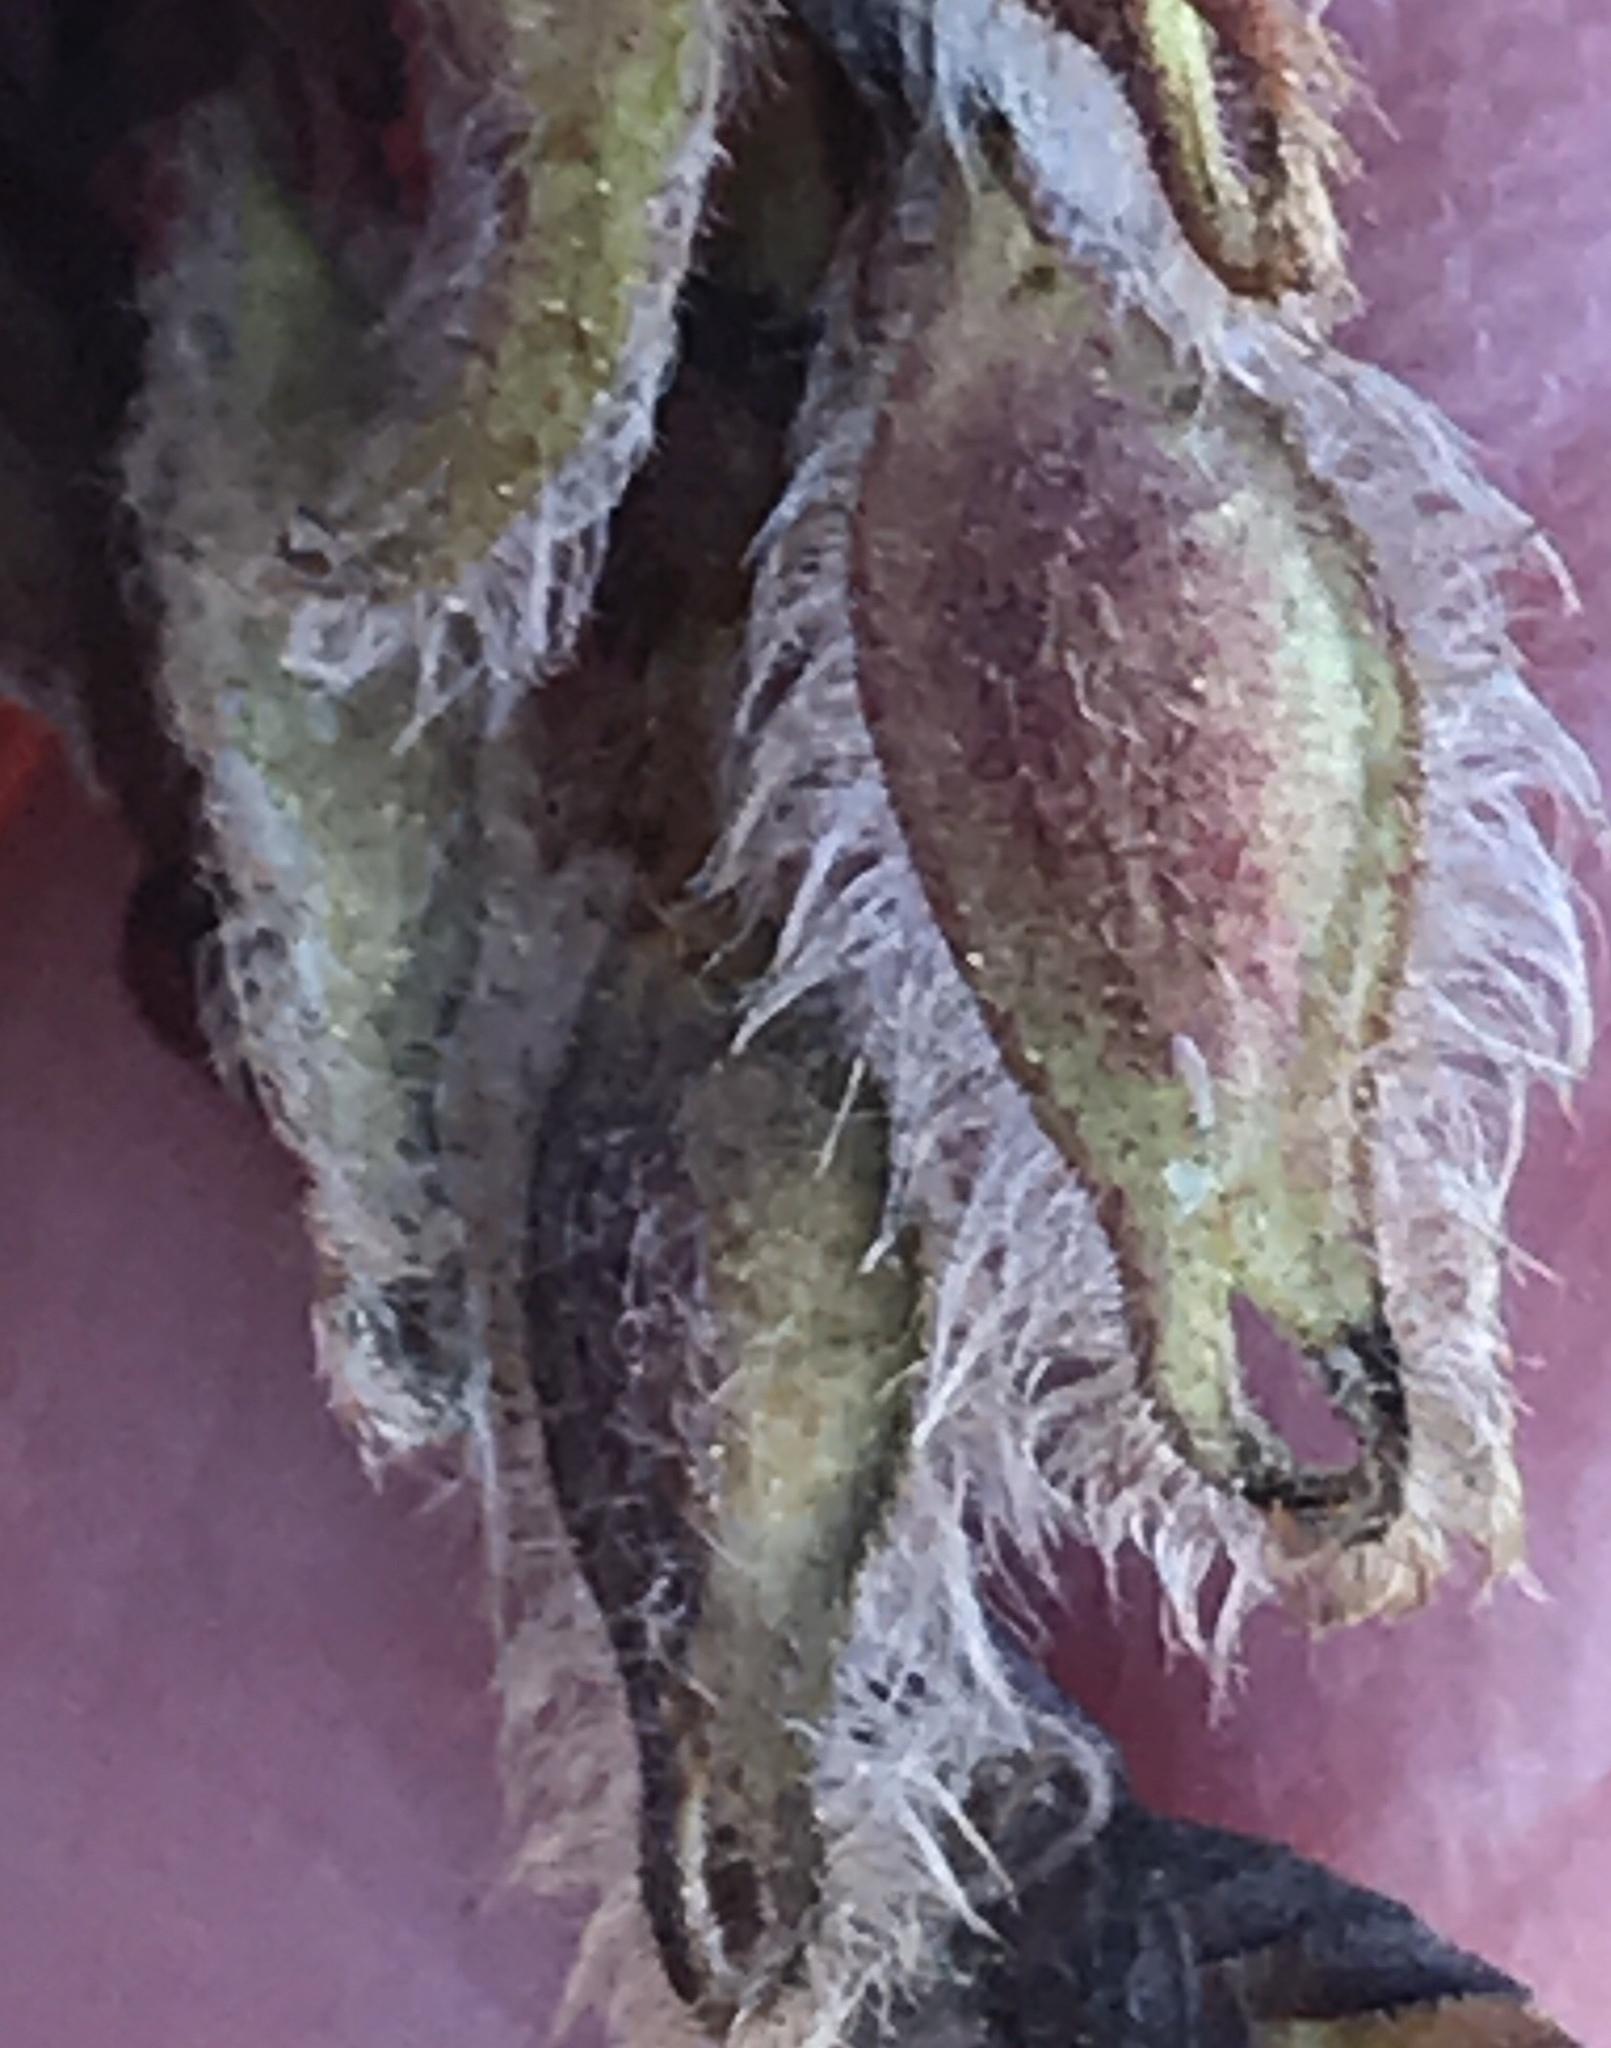 Spring samaras of Winged Elm